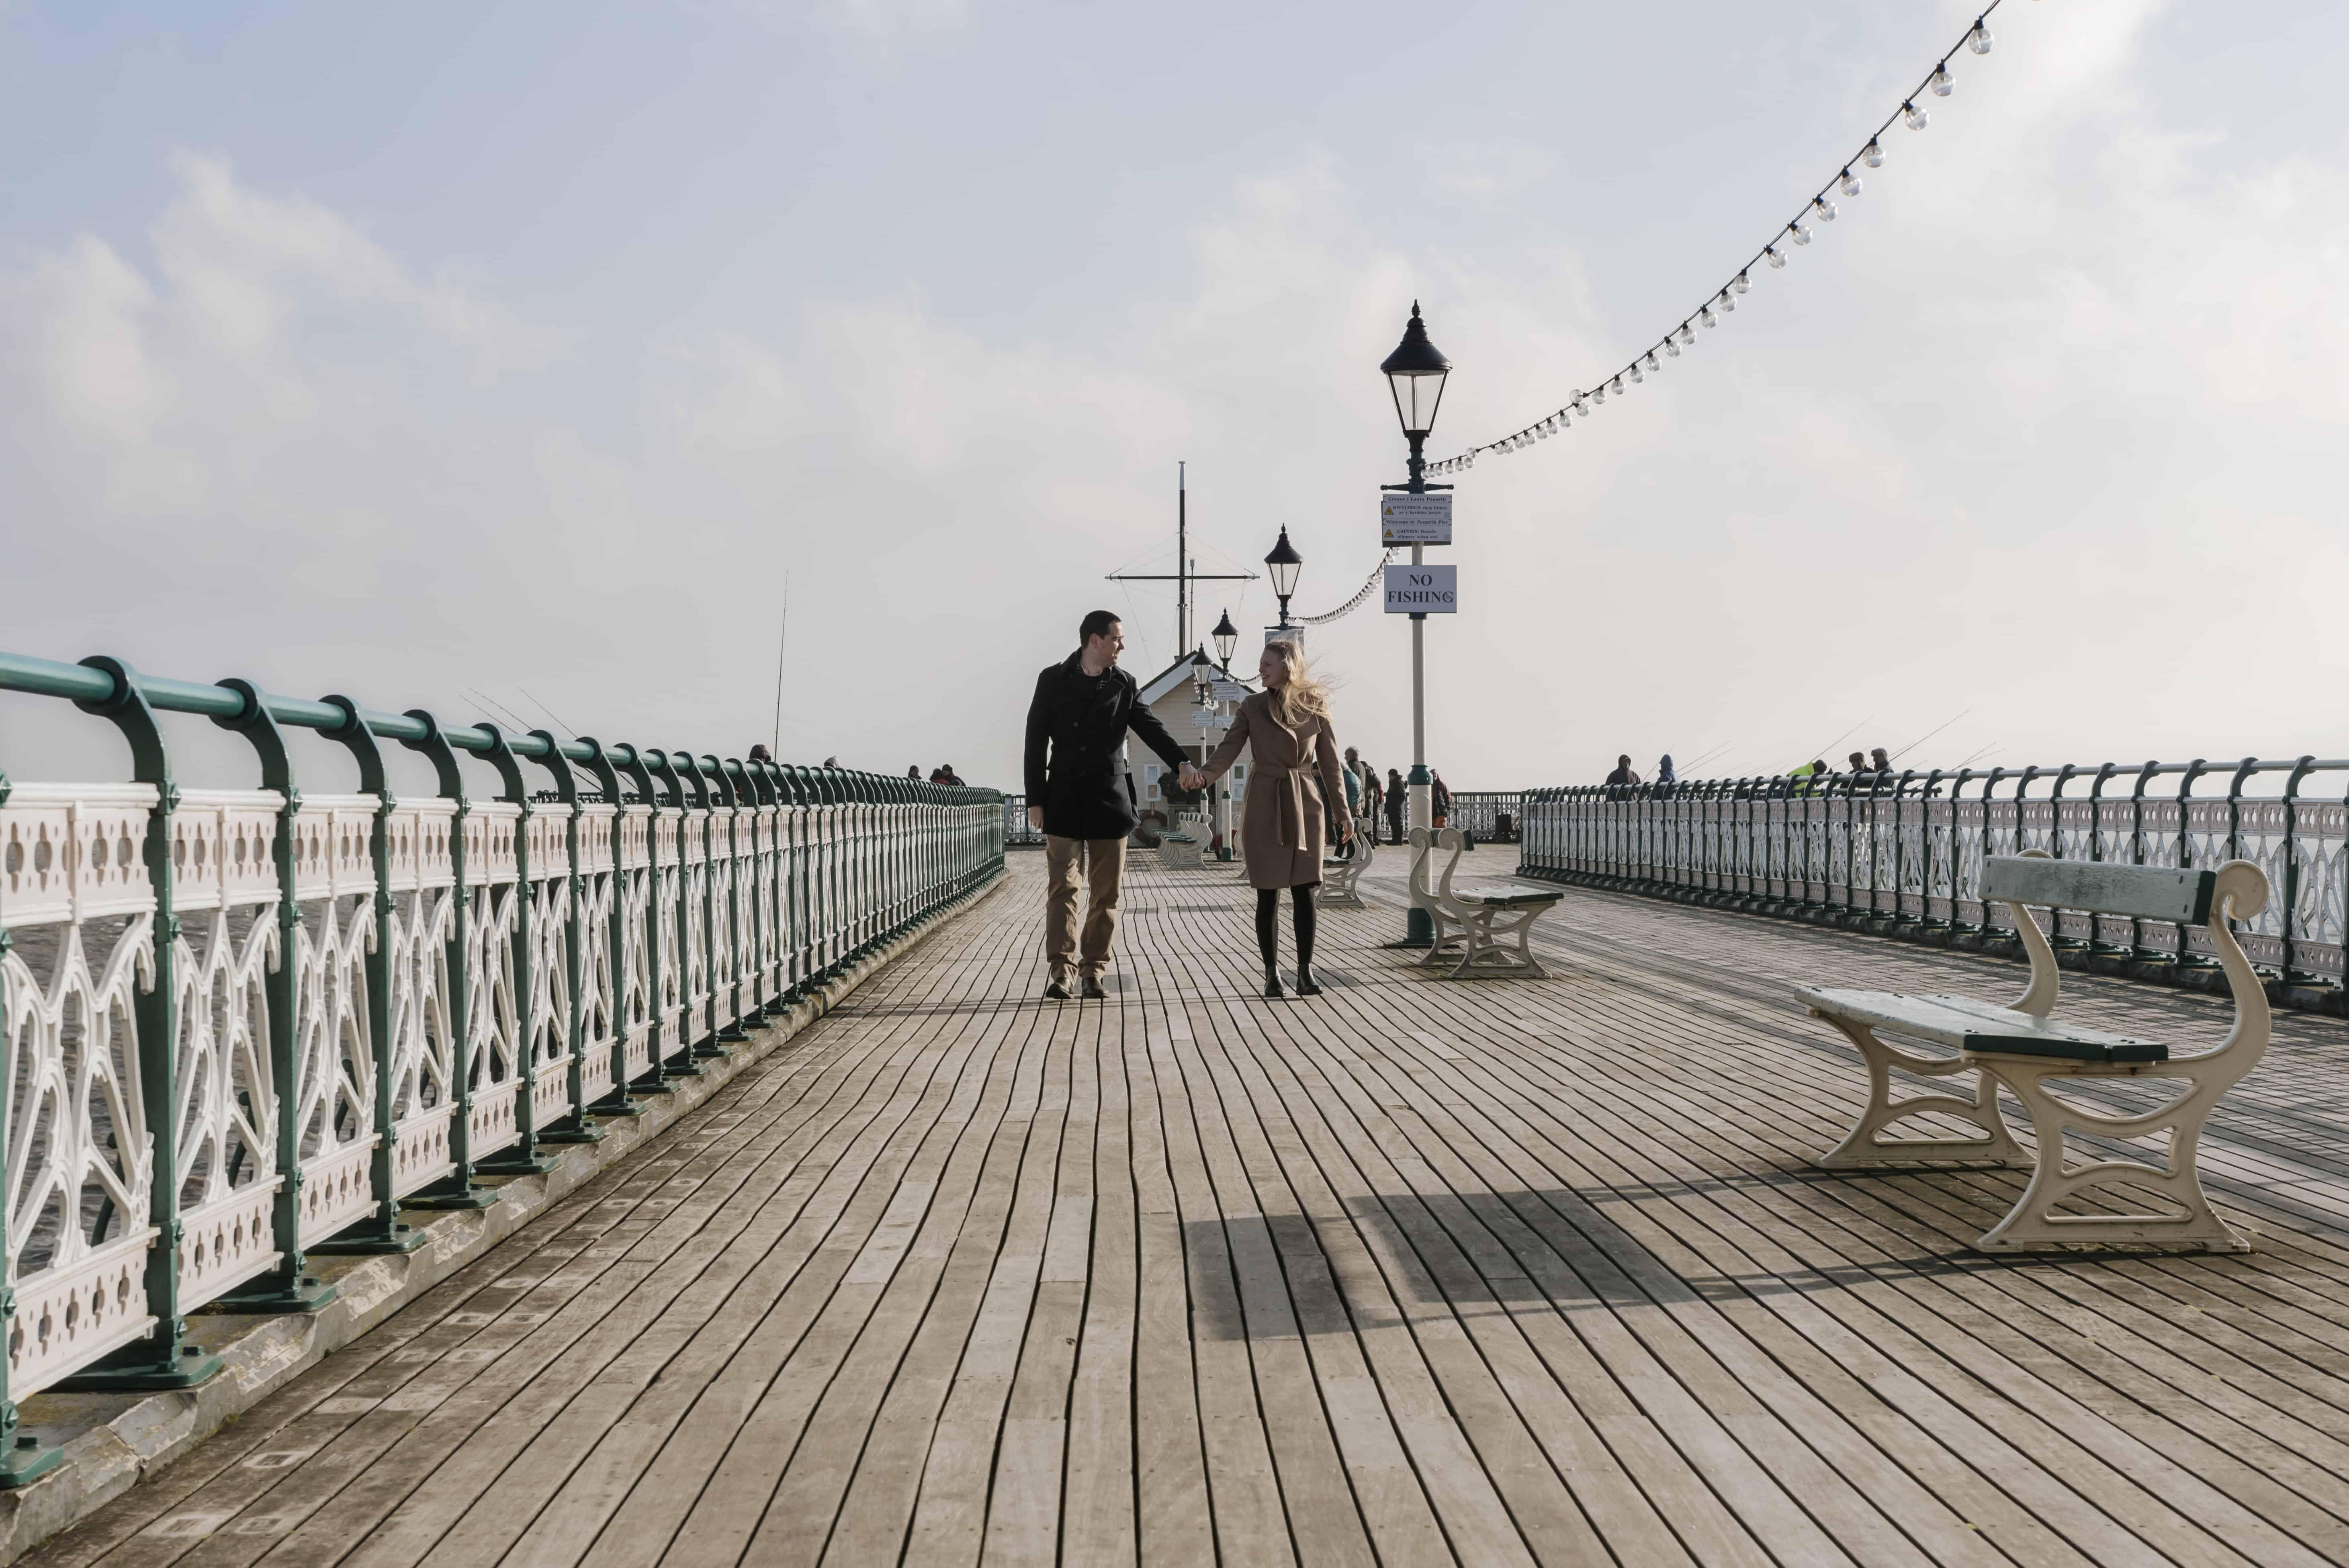 Couple walking down a pier